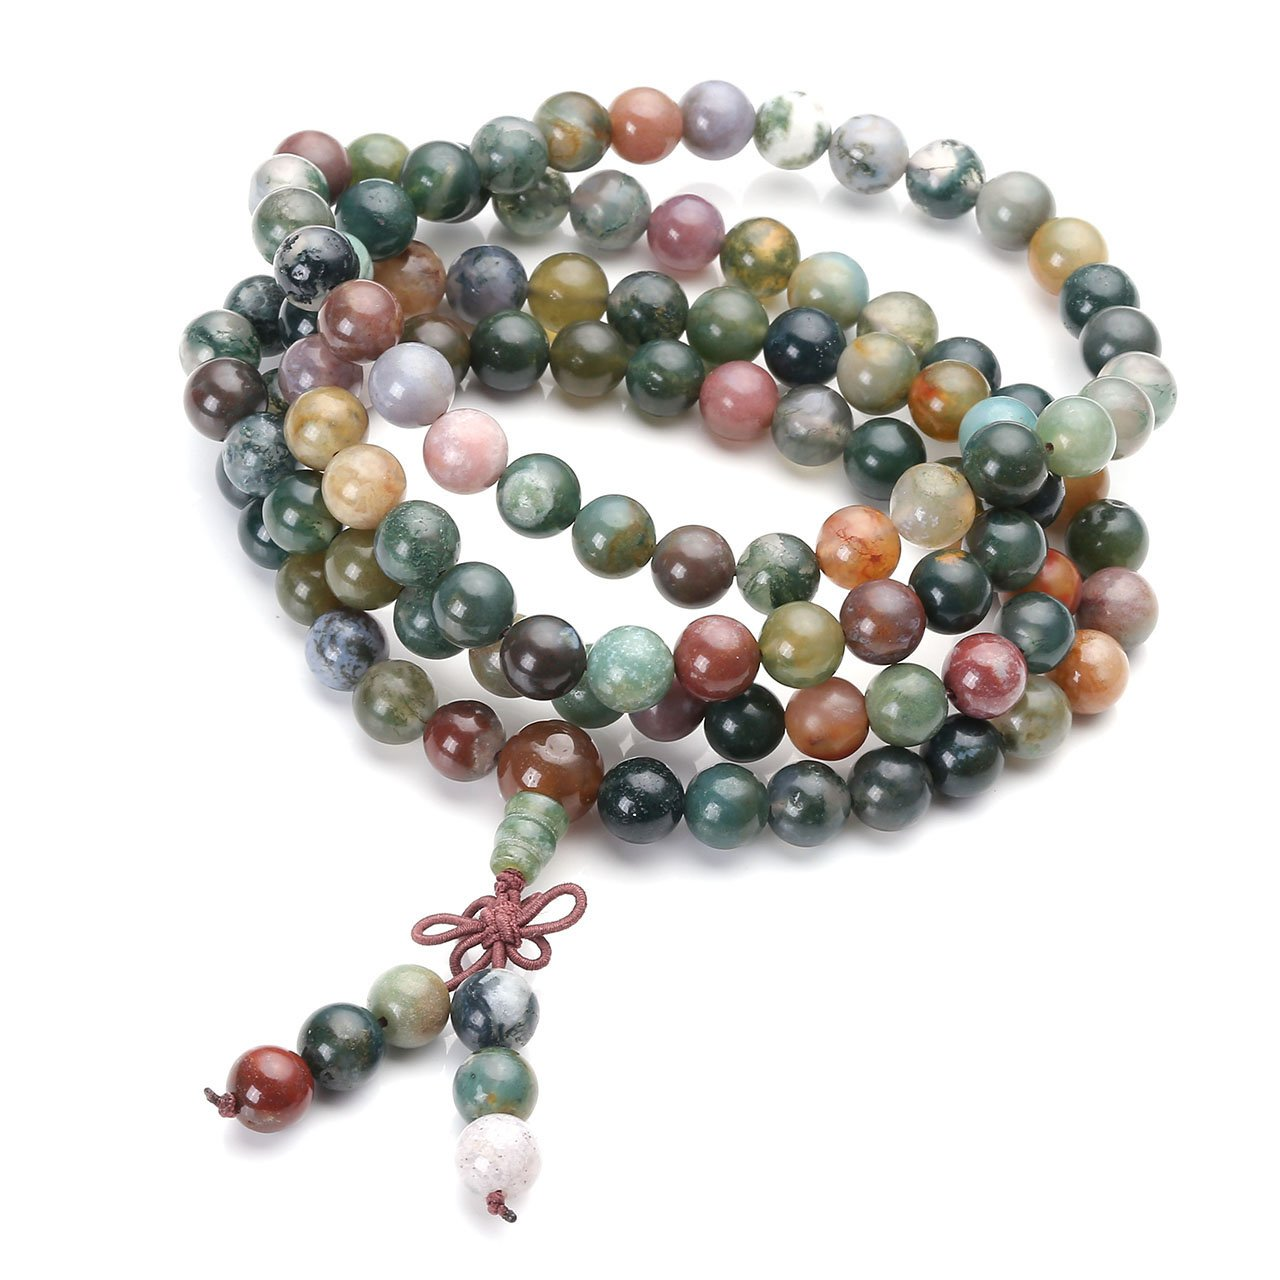 Jovivi Tibetan Buddhist Natural Indian Agate Gemstone 8mm 108 Prayer Mala Beads Bracelet Necklace AJ1010104809